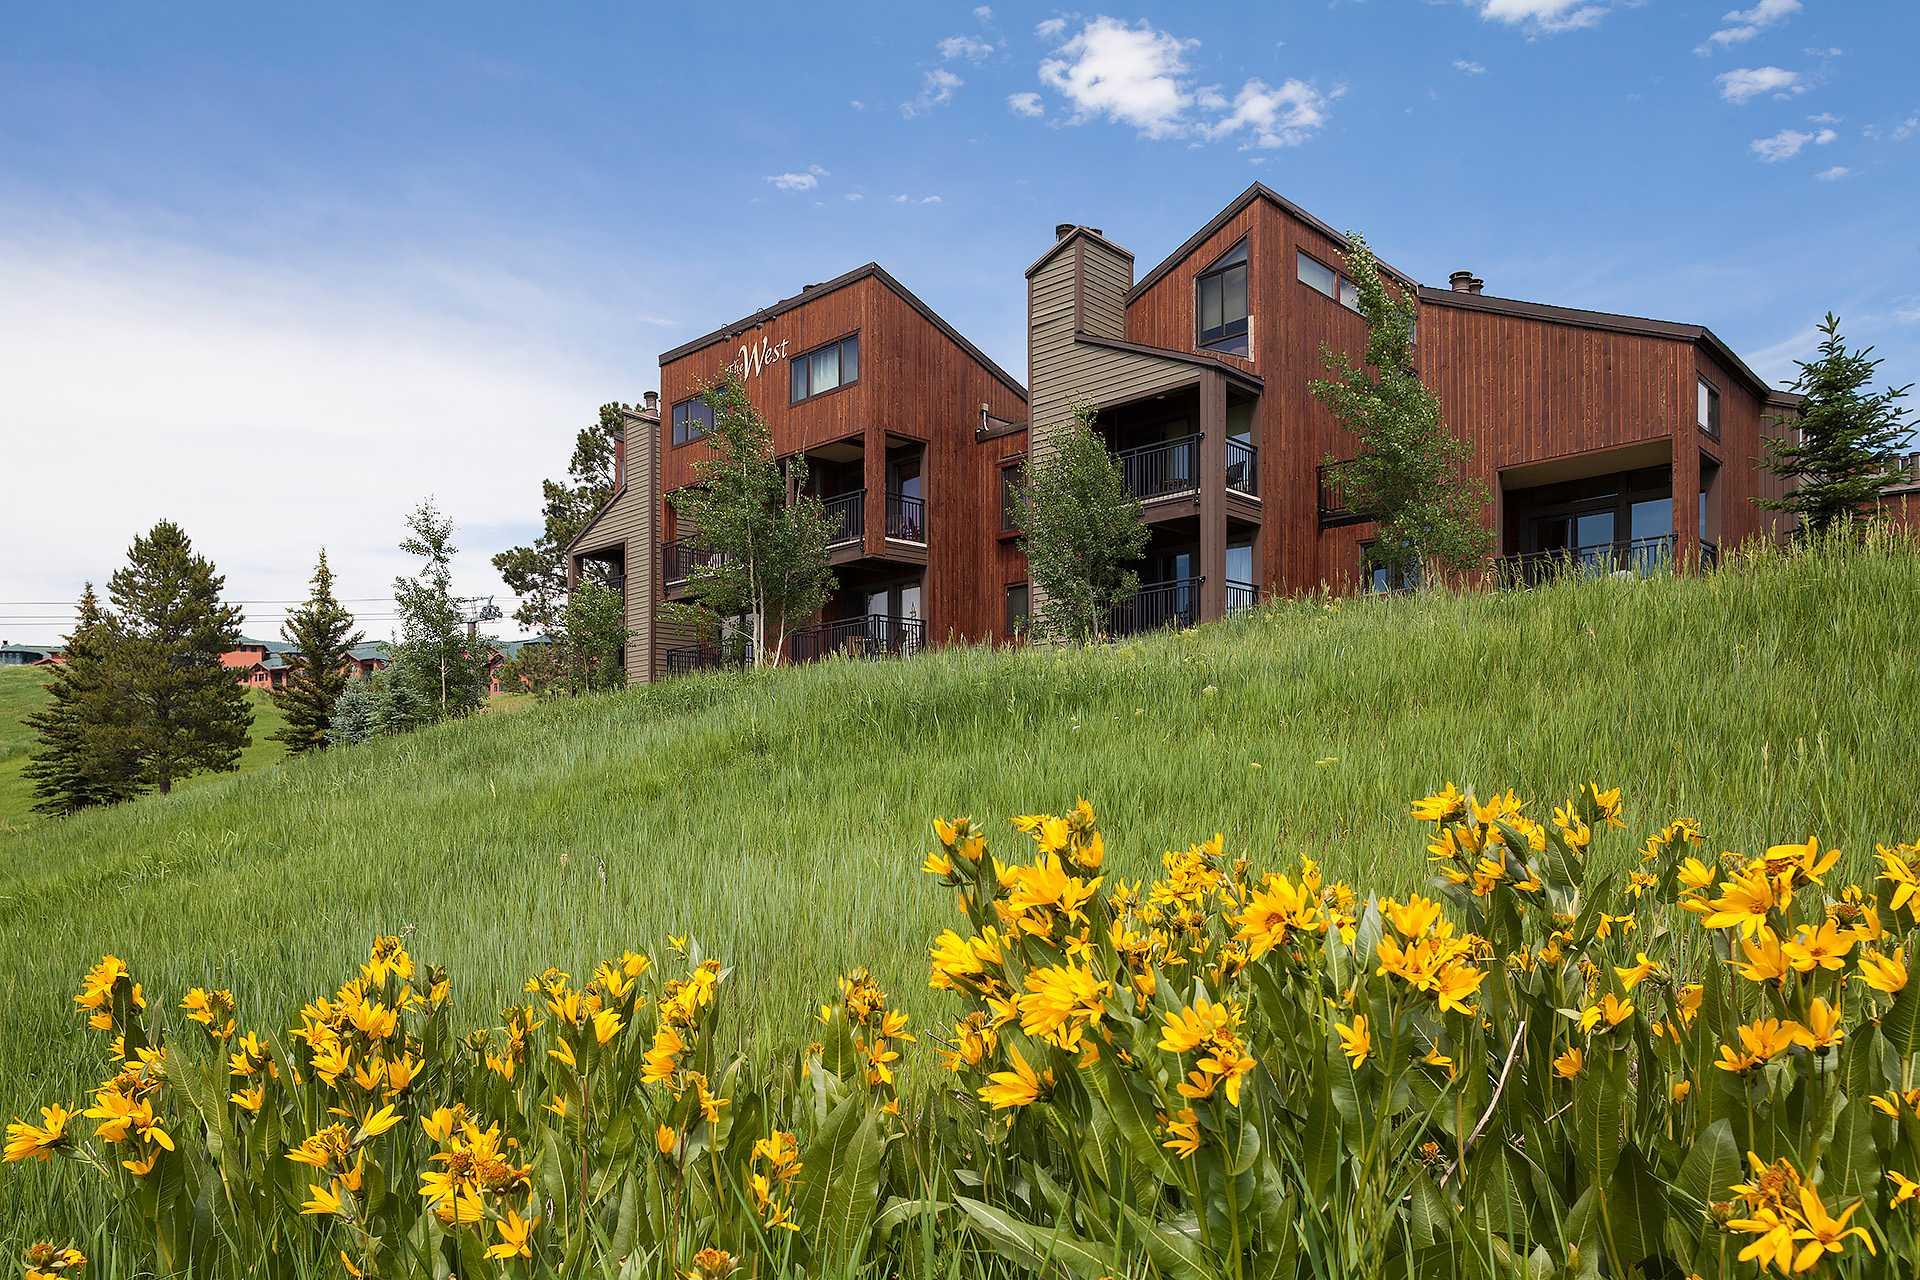 W3403: The West Condominiums